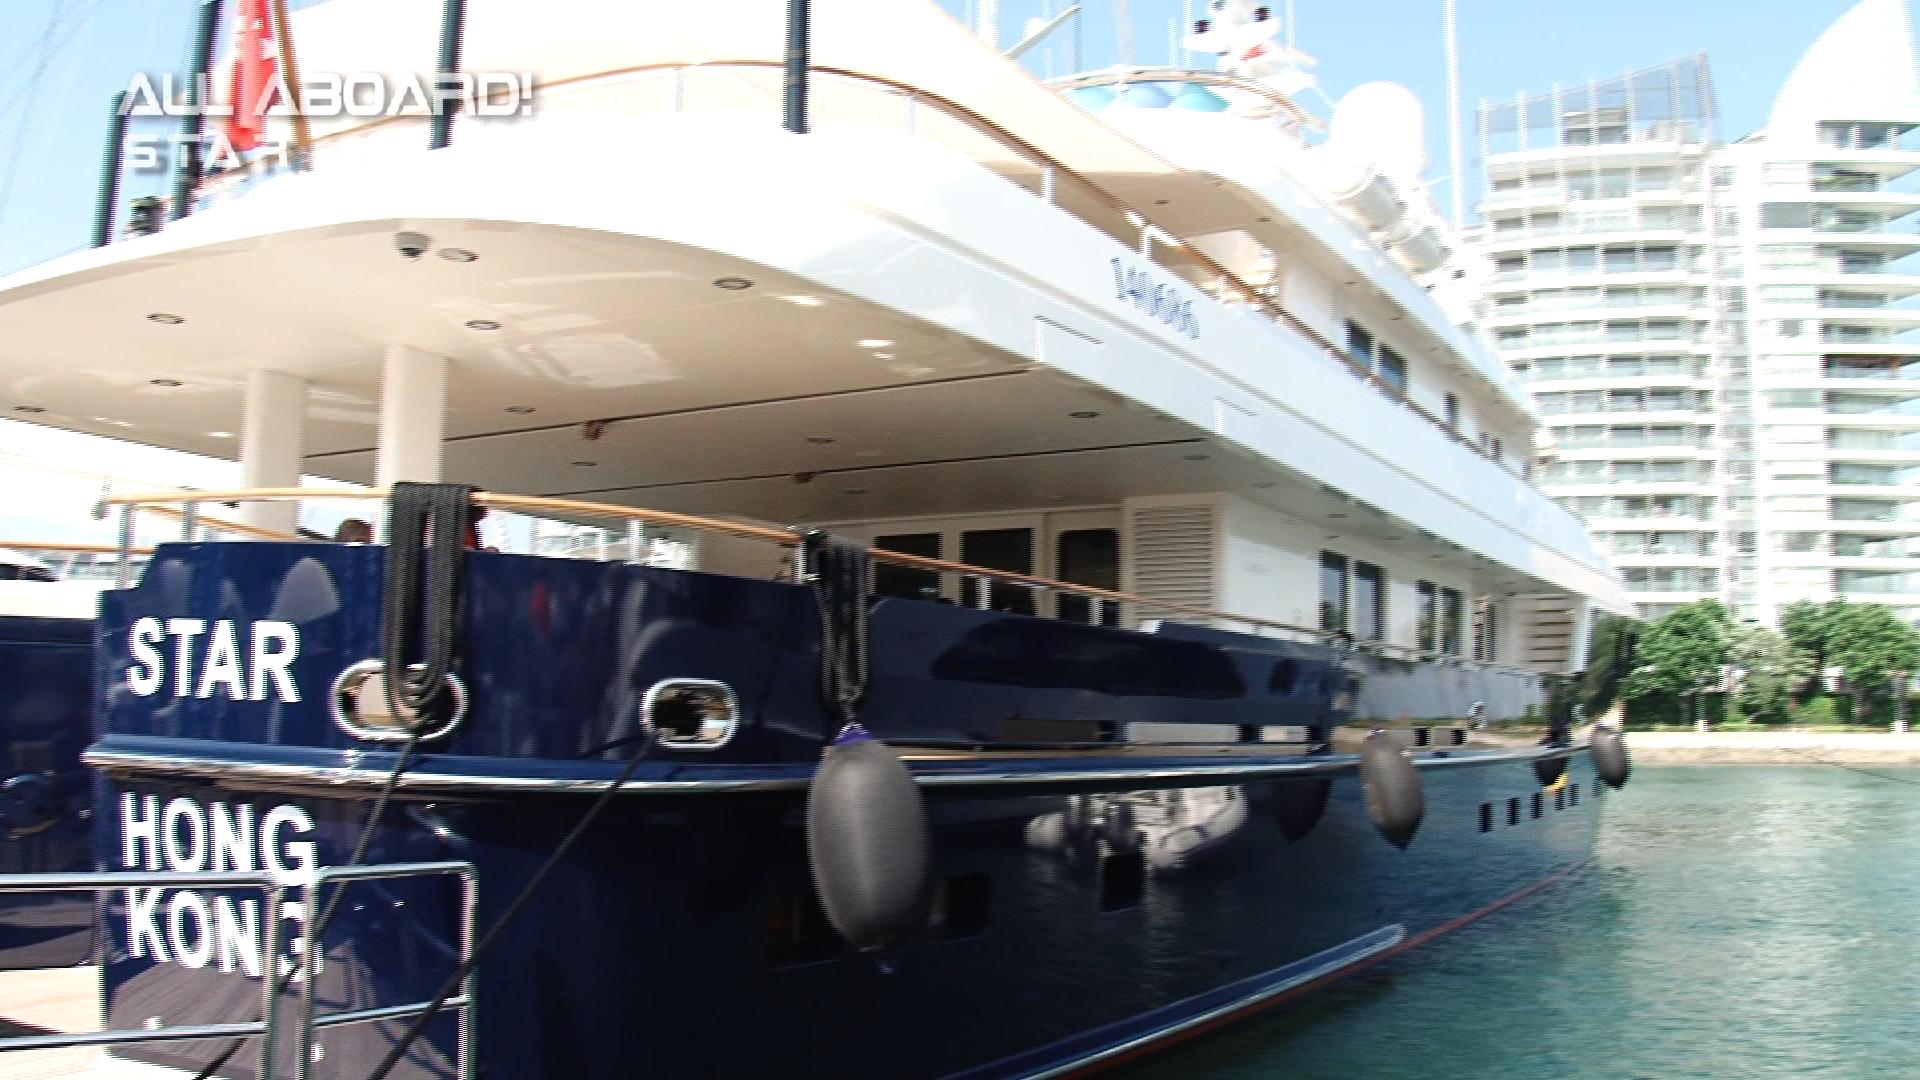 All Aboard! – Star